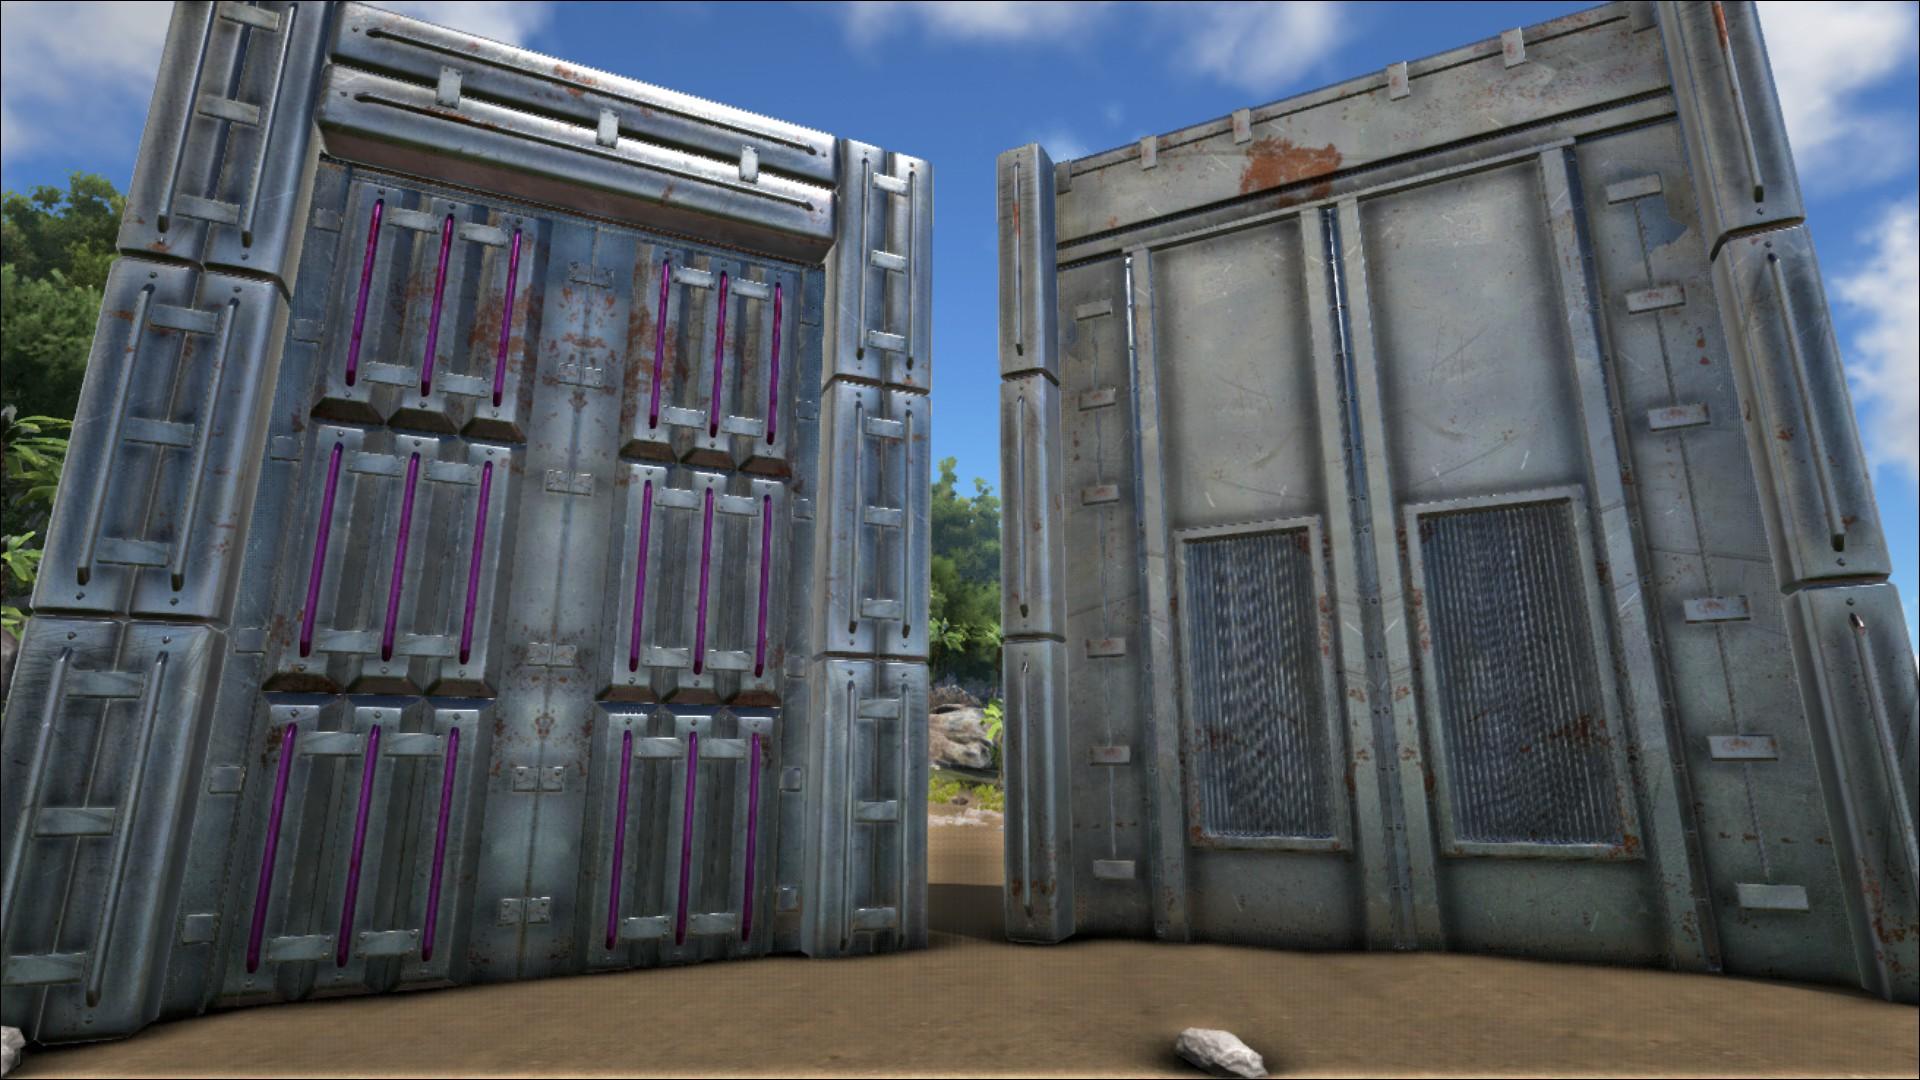 Metal Dinosaur Gate - Official ARK: Survival Evolved Wiki